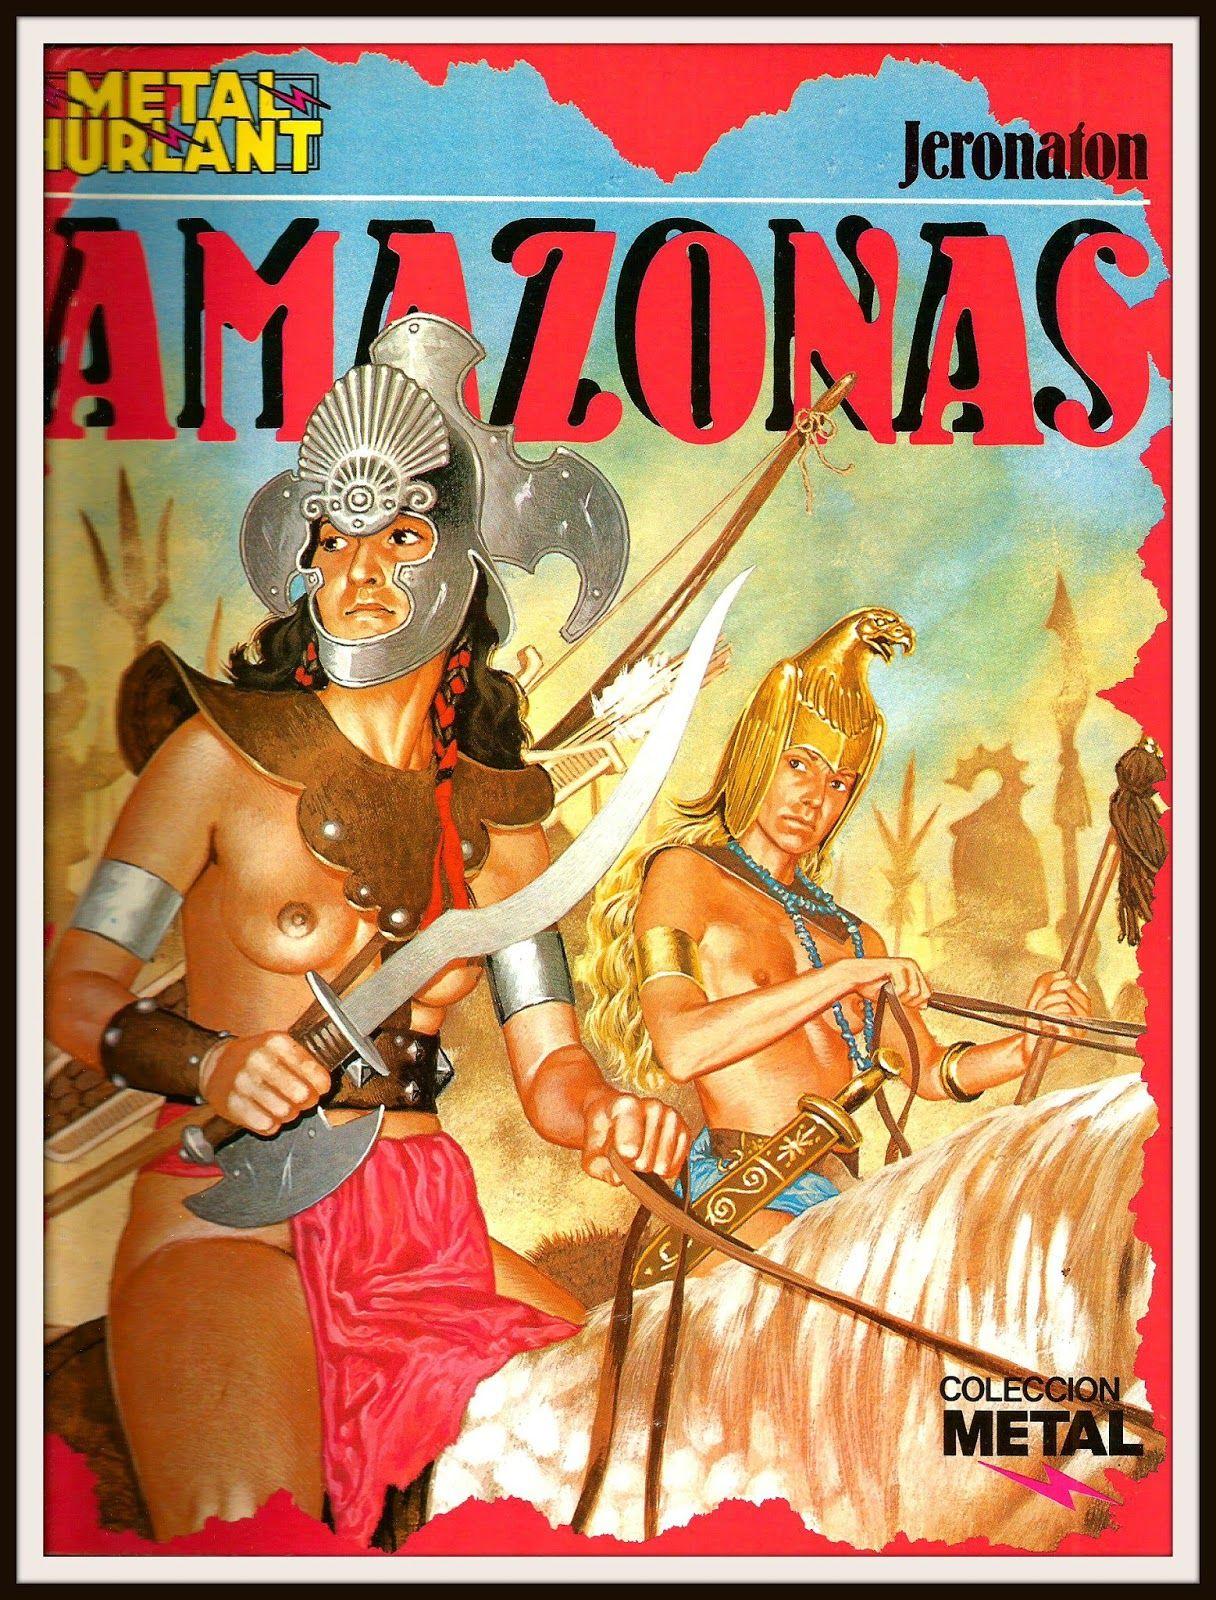 Amazonas Jeronaton Metal Hurlant Colección Metal Eurocomic Madrid 1984